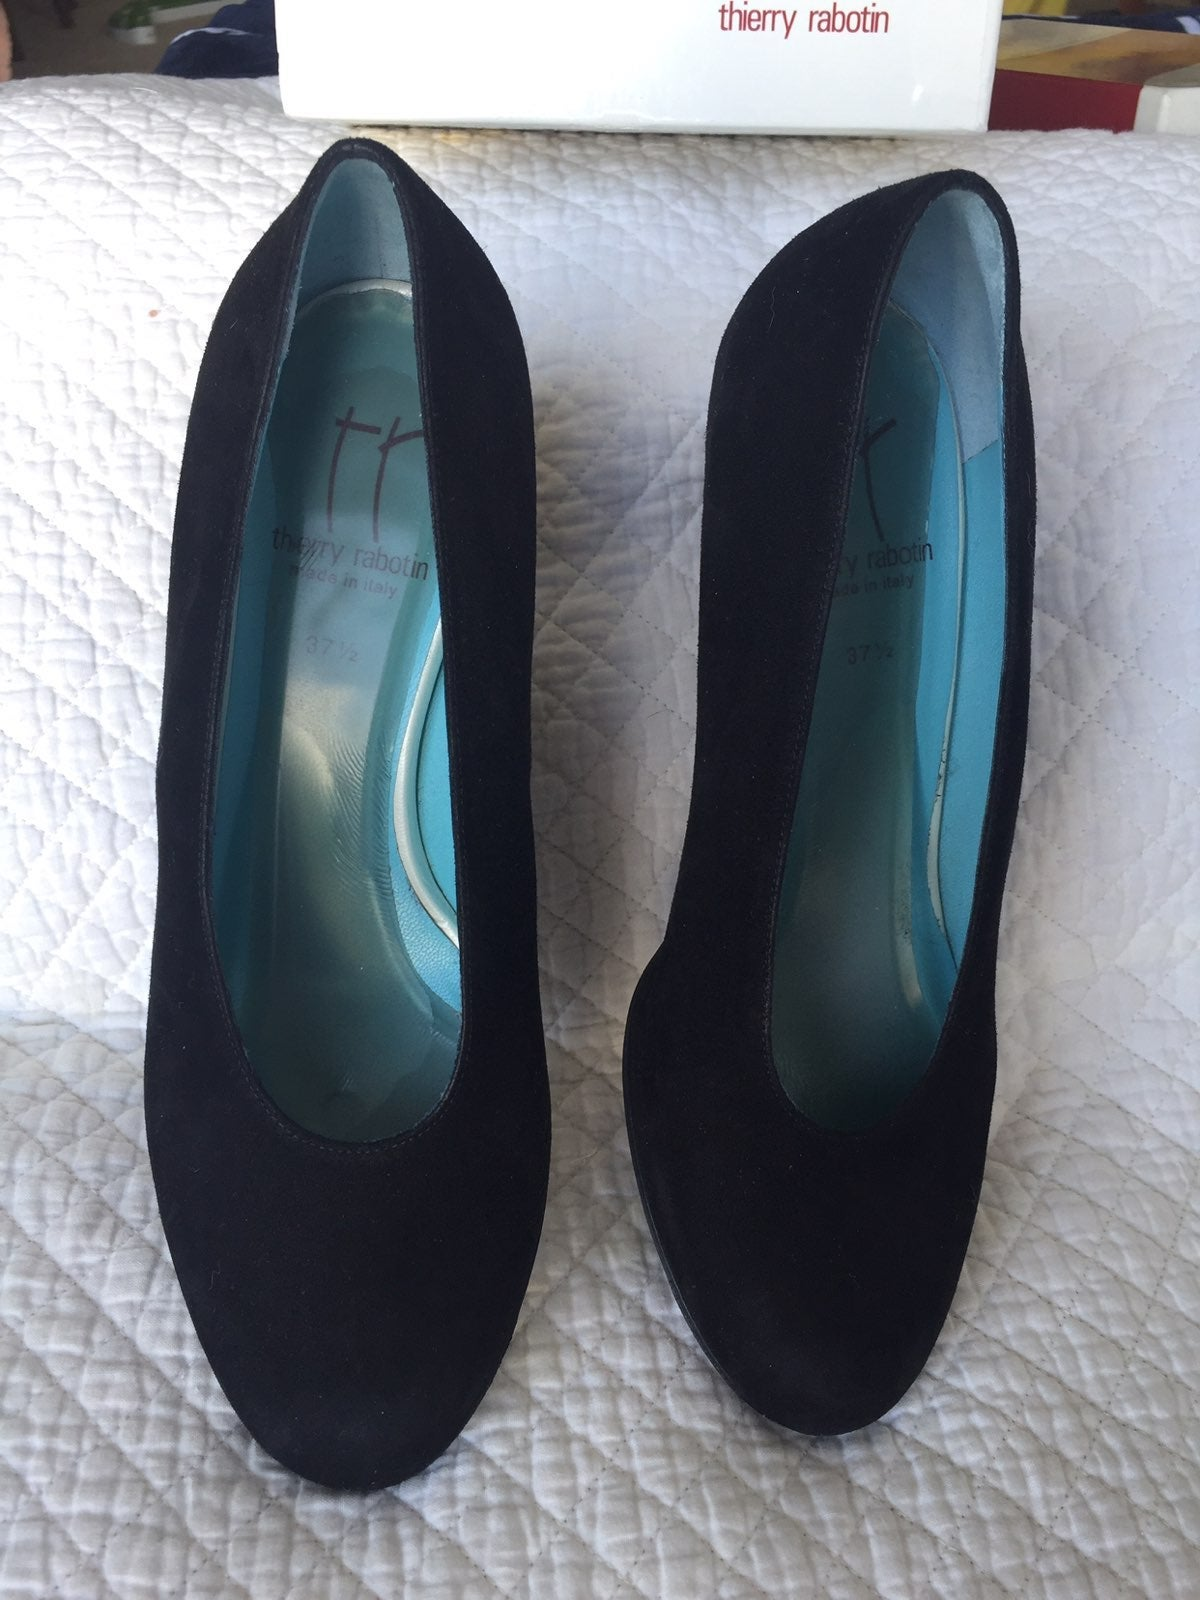 Size 7 - Thierry Rabotin $425 Suede Heel